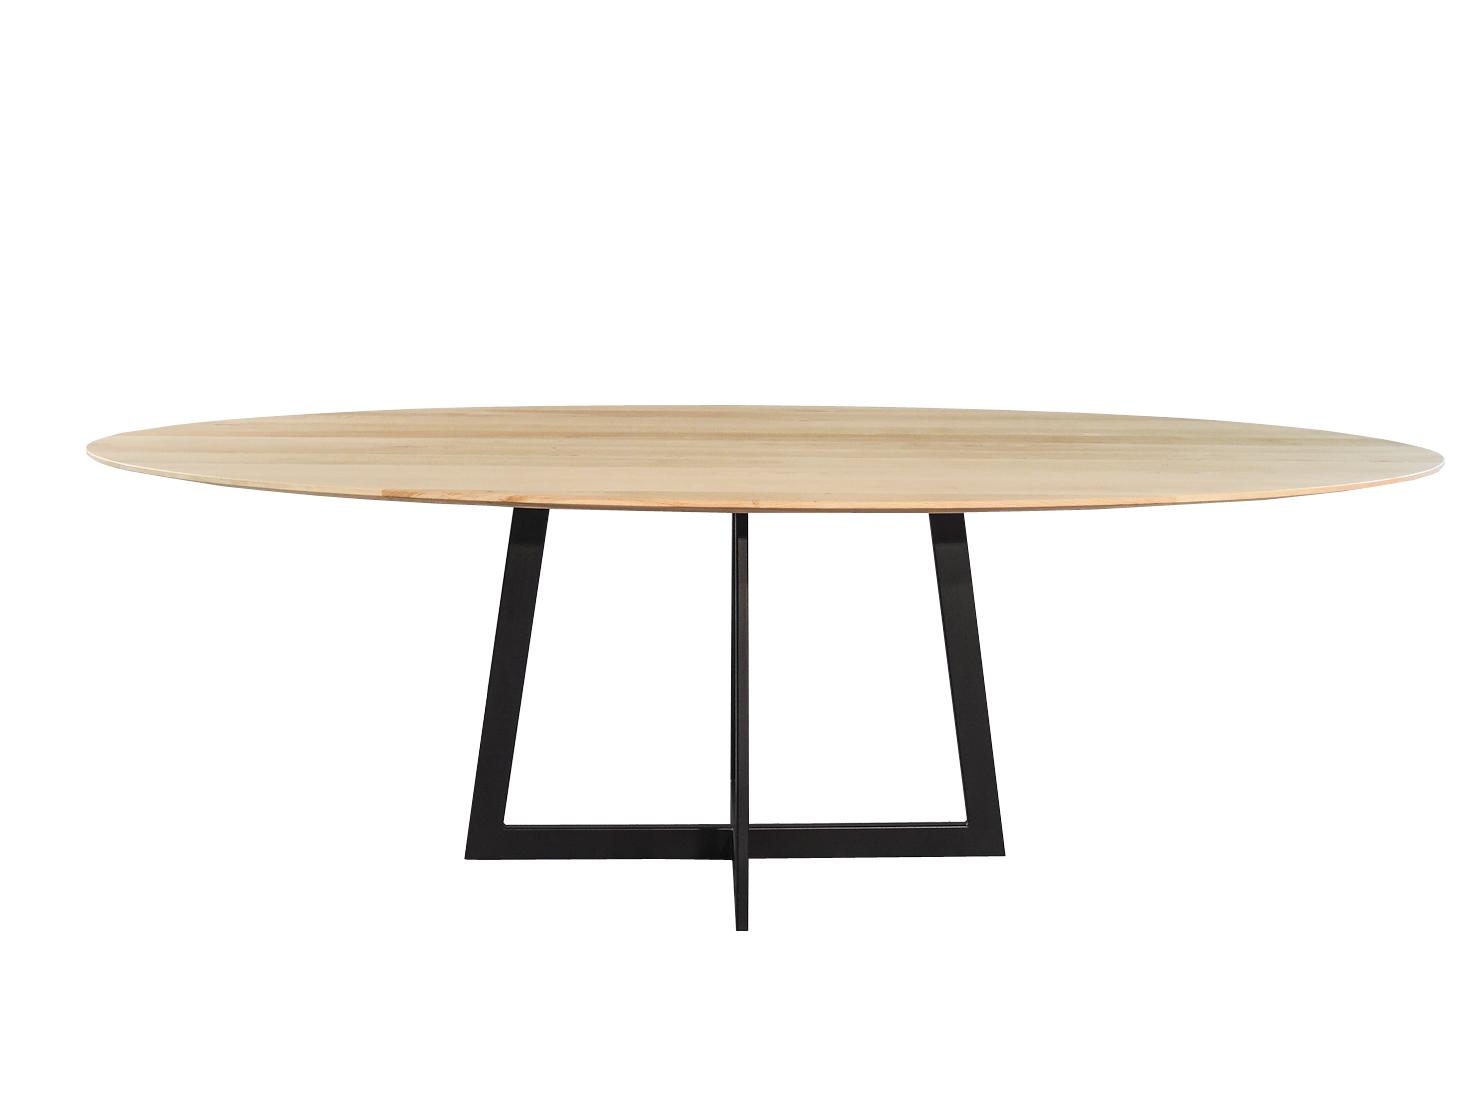 Glazen Eettafel 6 Personen.Varese Ovale Design Eettafel